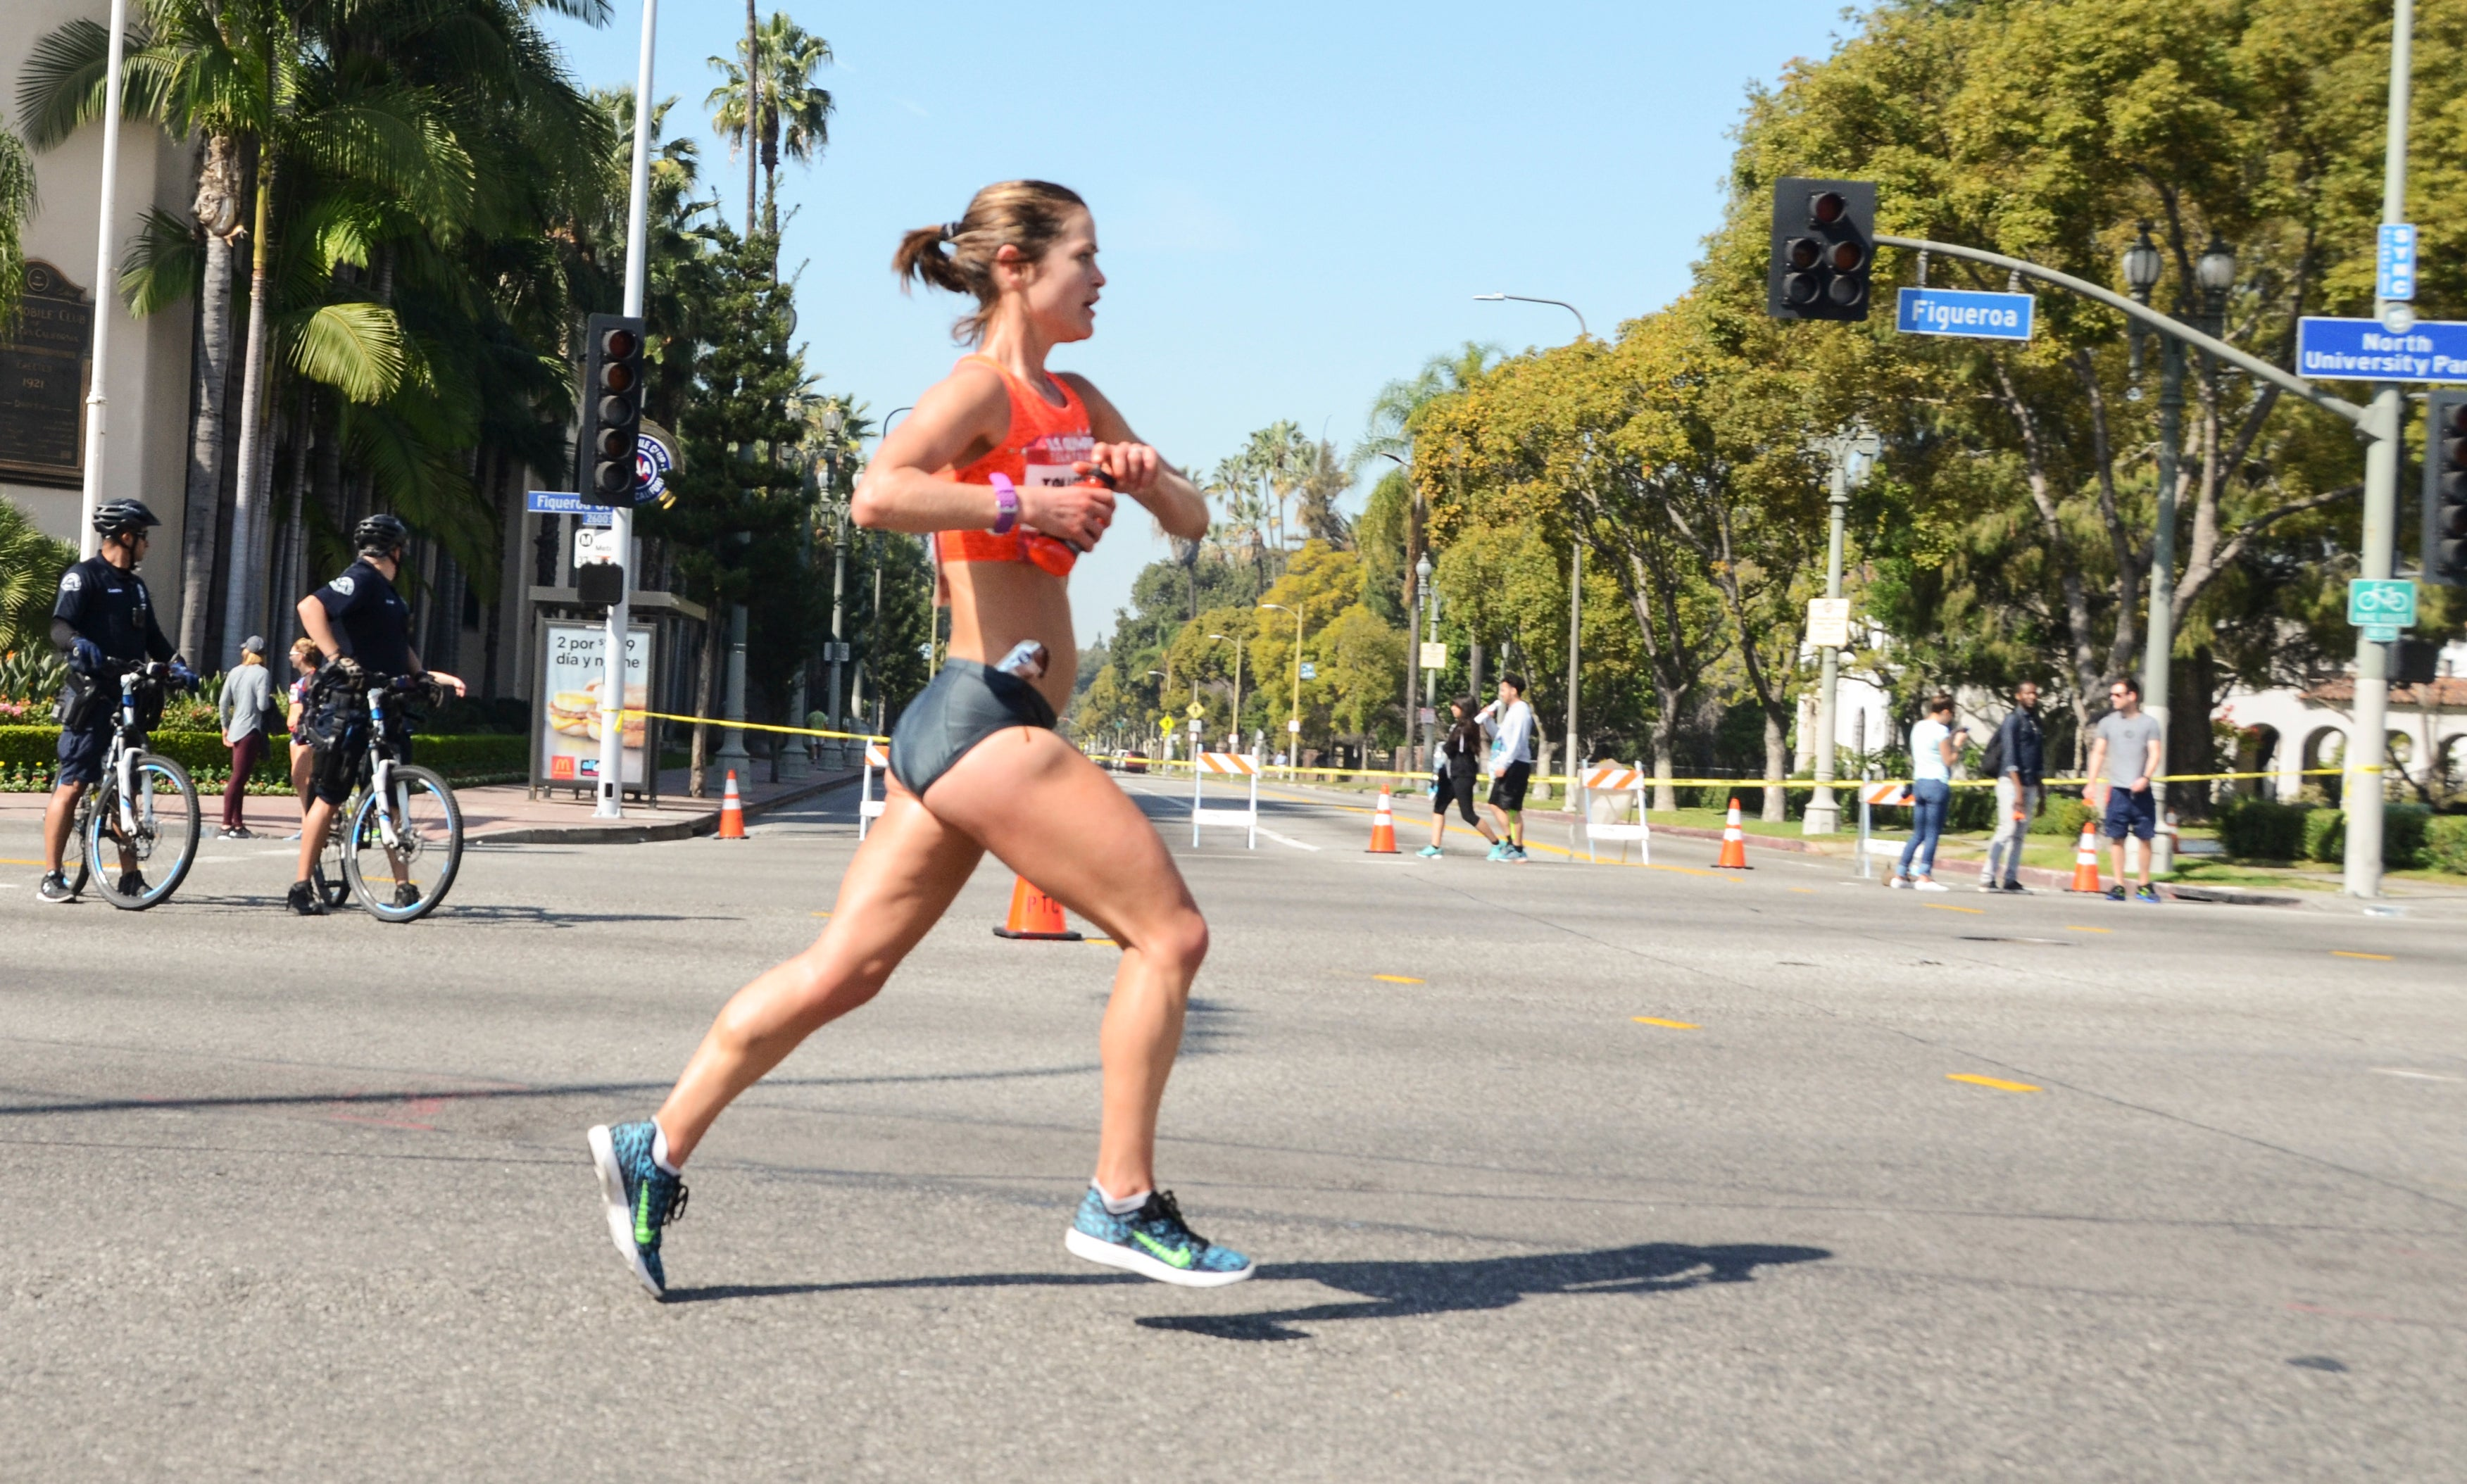 late-race marathon fueling